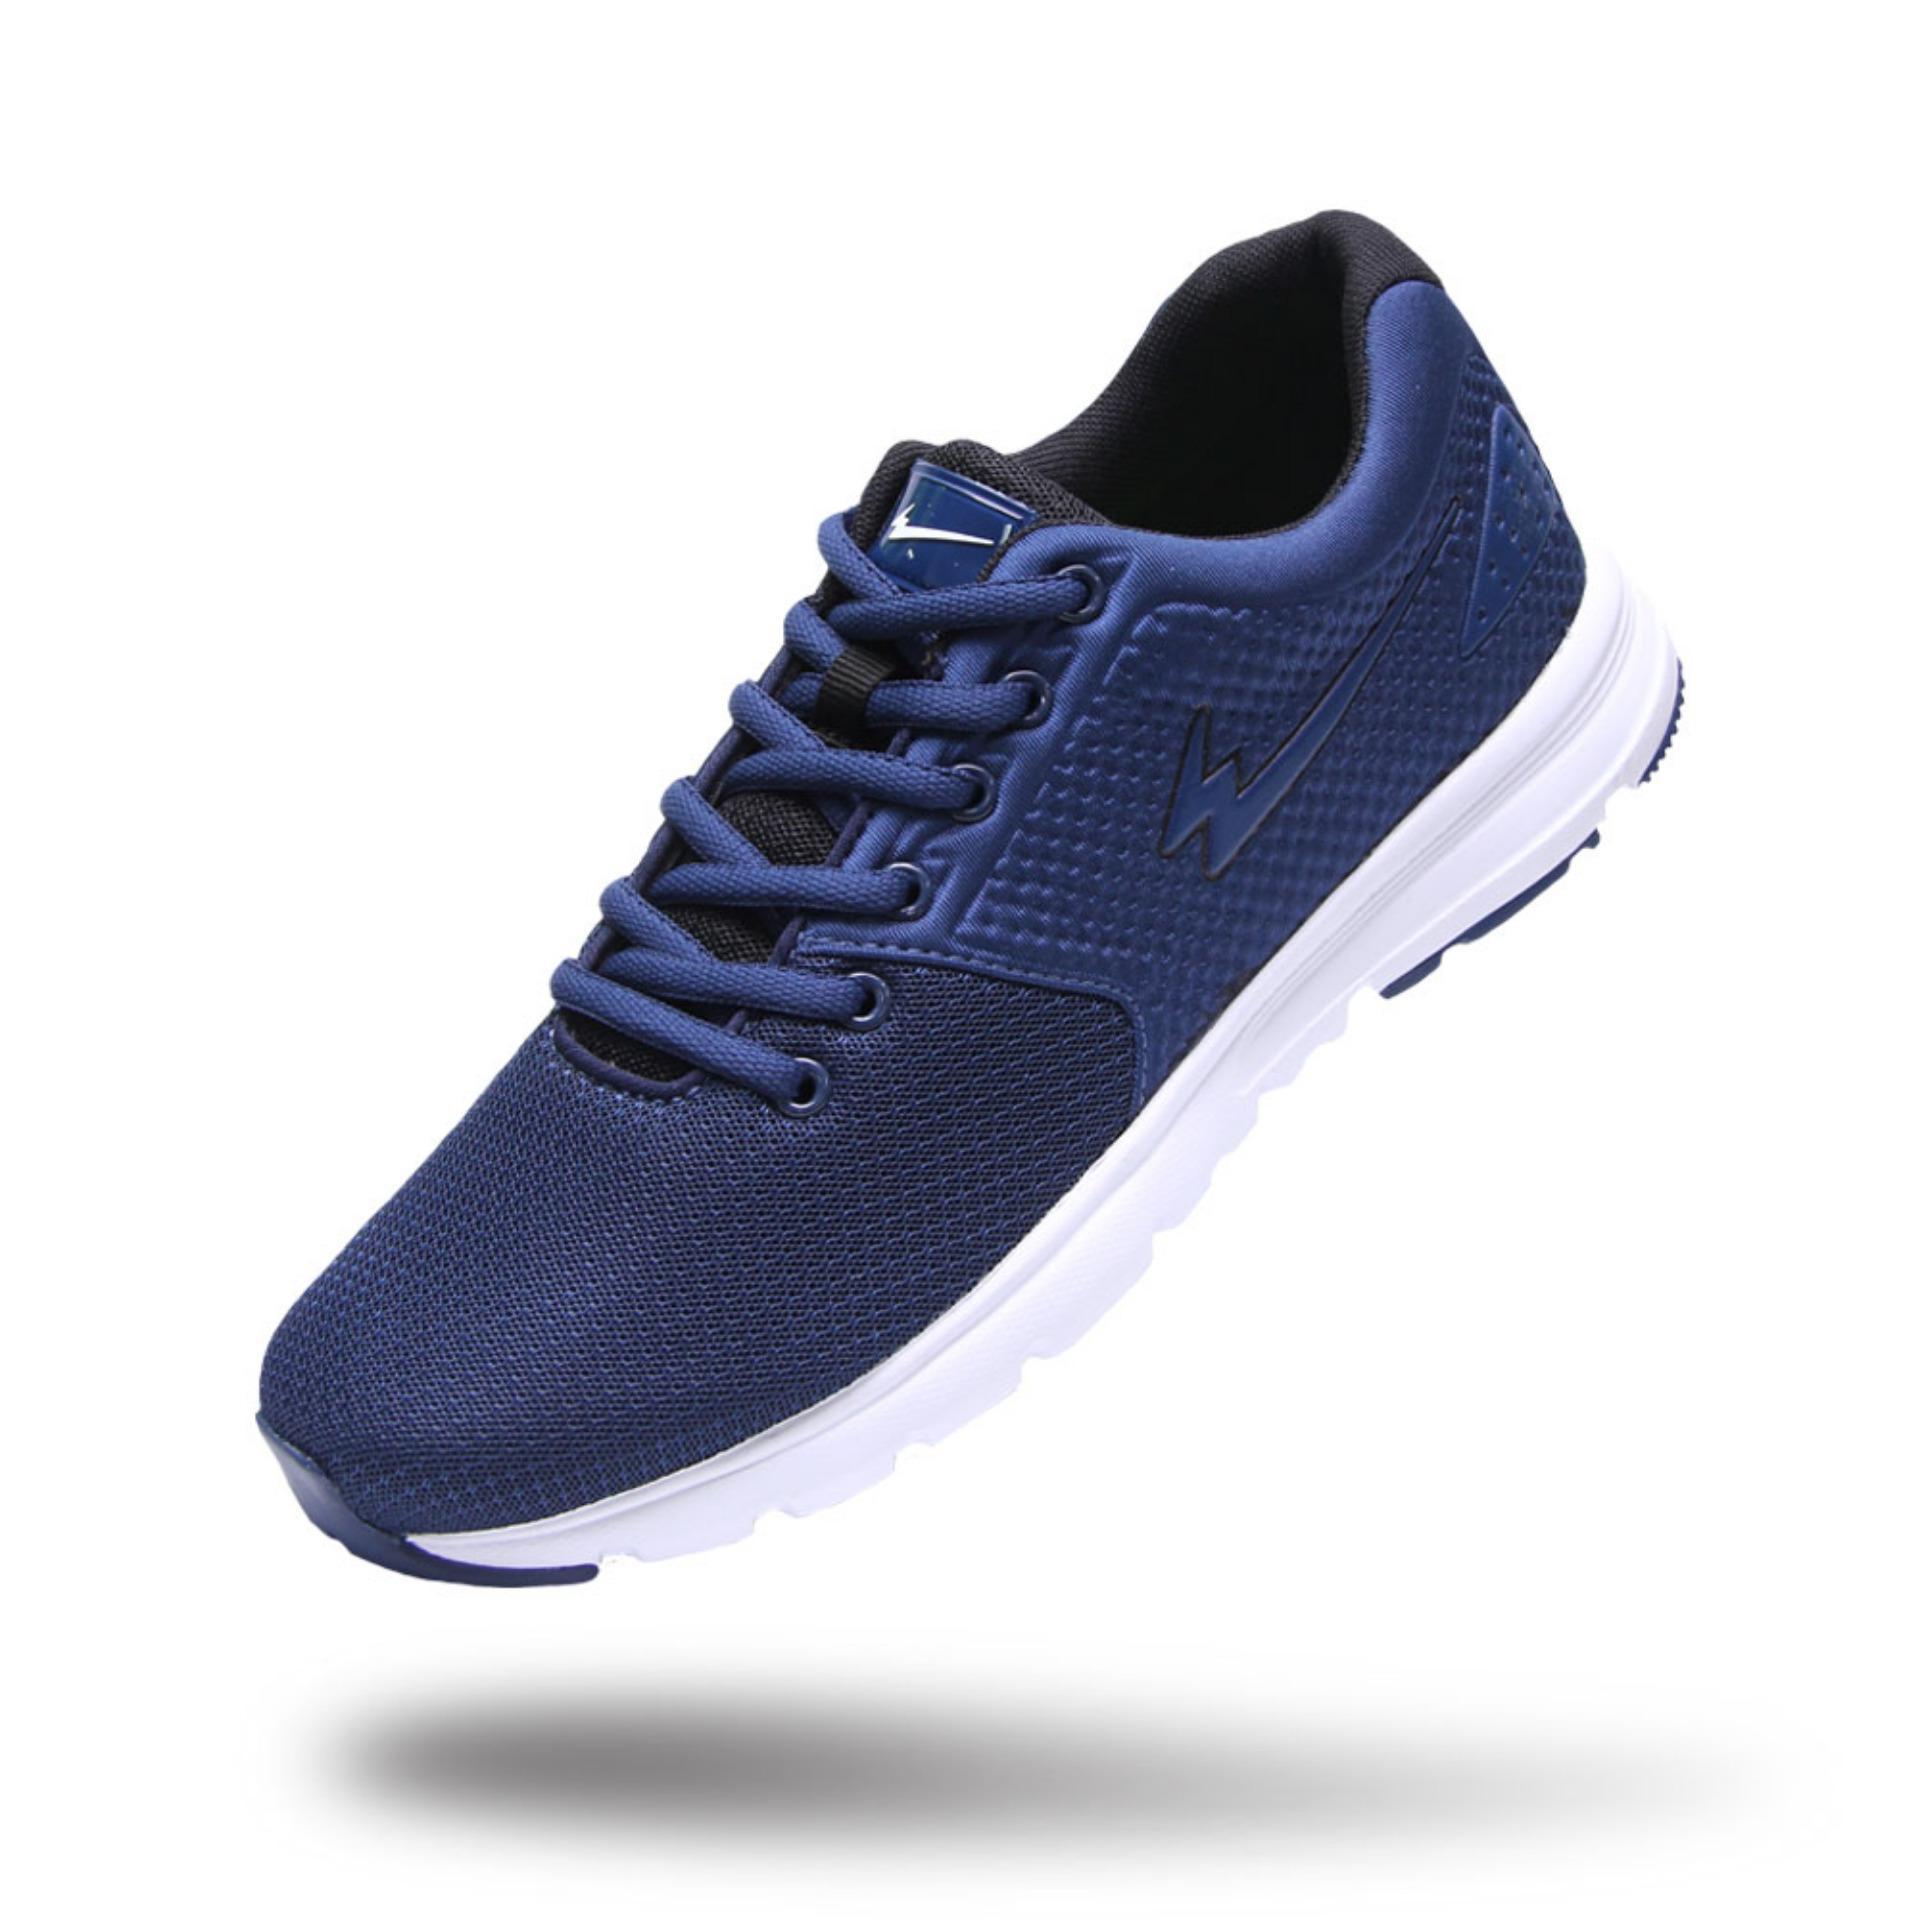 Tips Beli Eagle Sepatu Sneaker Wanita Eagle Sepatu Olahraga Wanita Eagle Hybrid Sepatu Sneaker Eagle Sepatu Olah Raga Eagle Hybrid Navy Yang Bagus